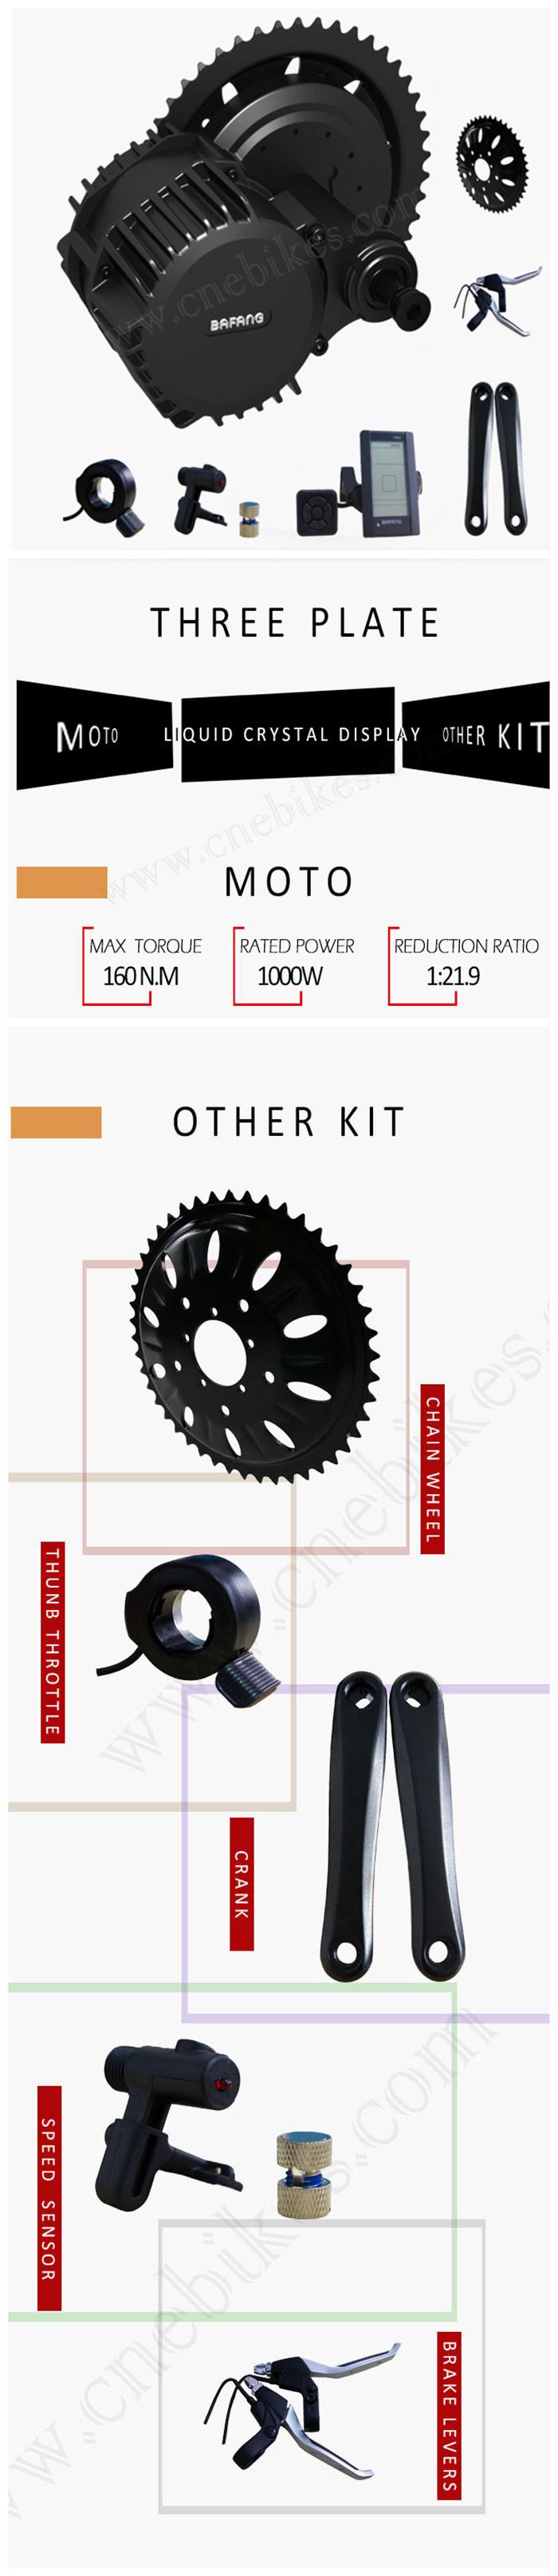 [Hot Item] MID Drive Engine Bafang 48V 1000W Bbshd Ebike Kit